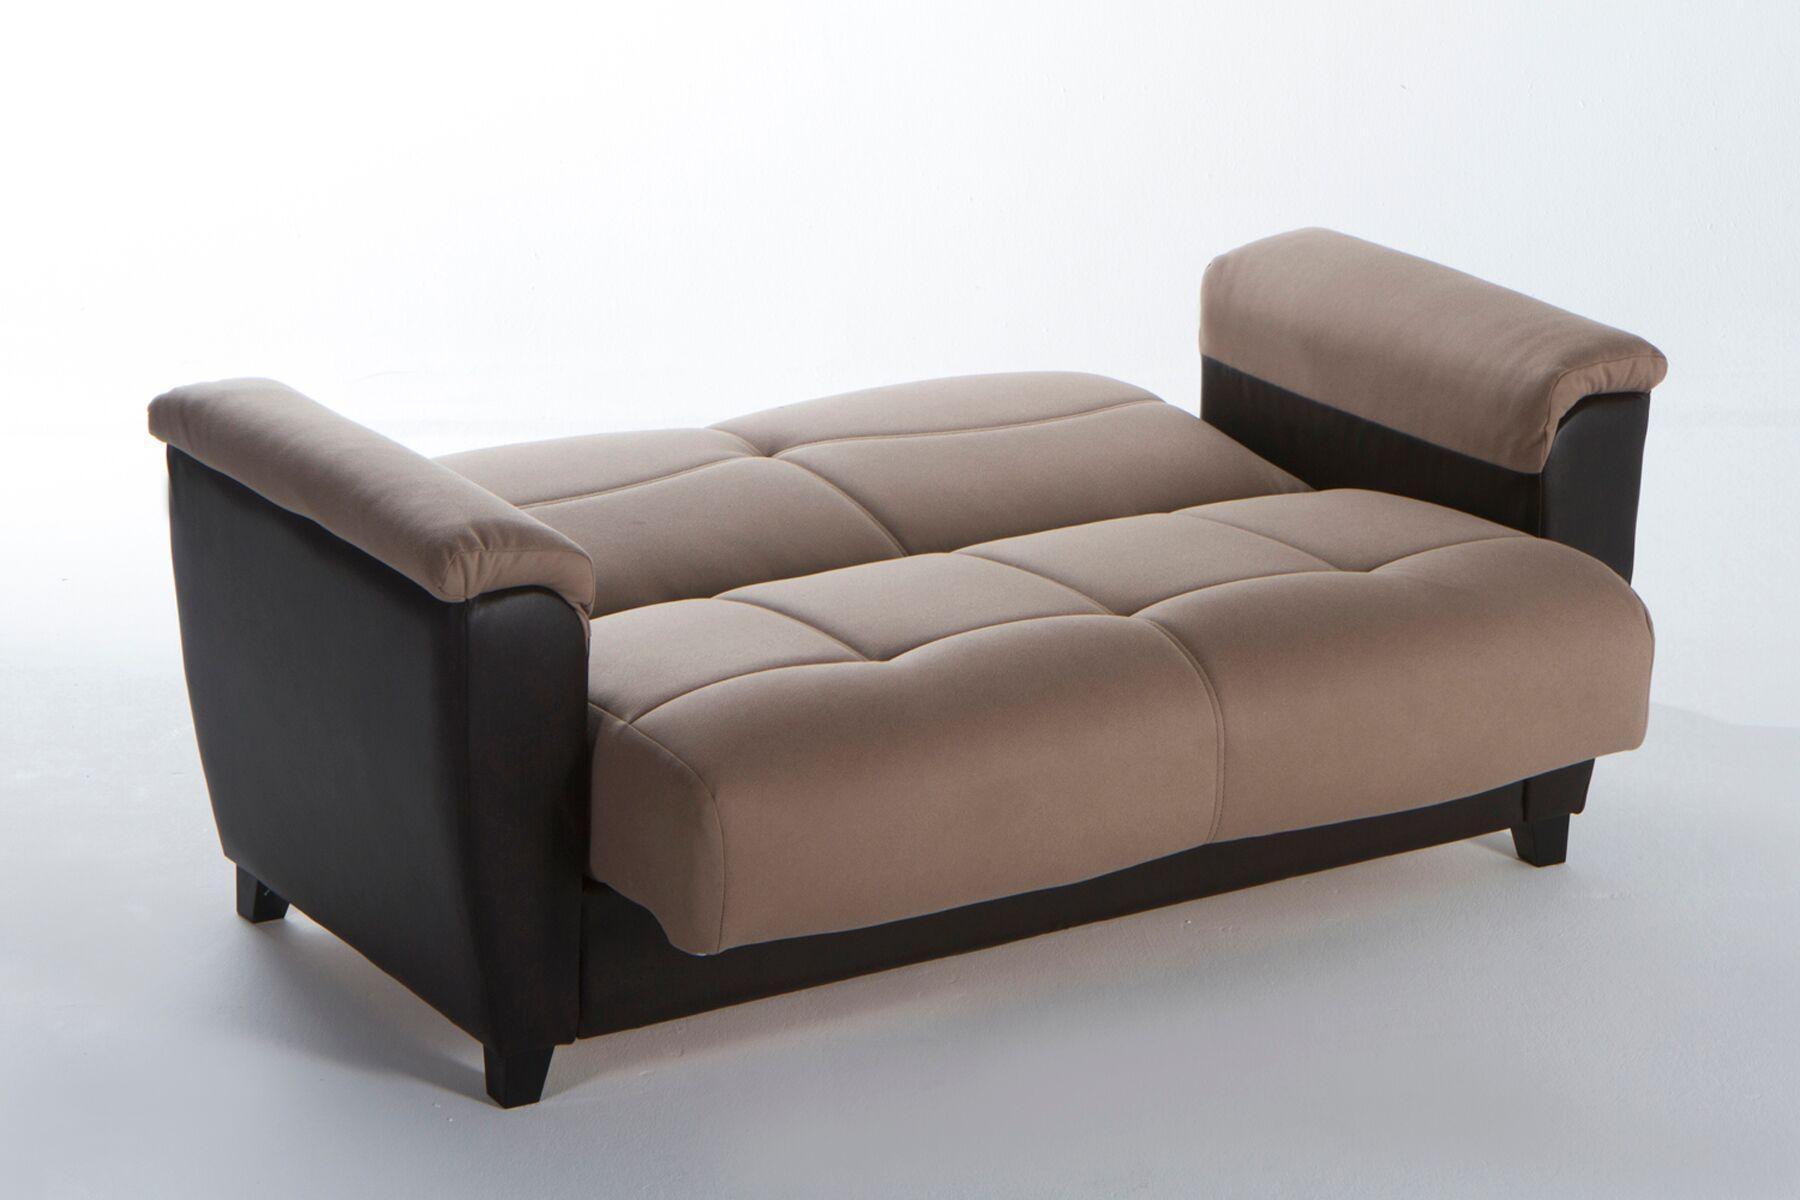 Aspen Milano Vizon Sofa Su Aspen Sunset Furniture Fabric Sofas At Within Aspen Leather Sofas (Image 7 of 20)